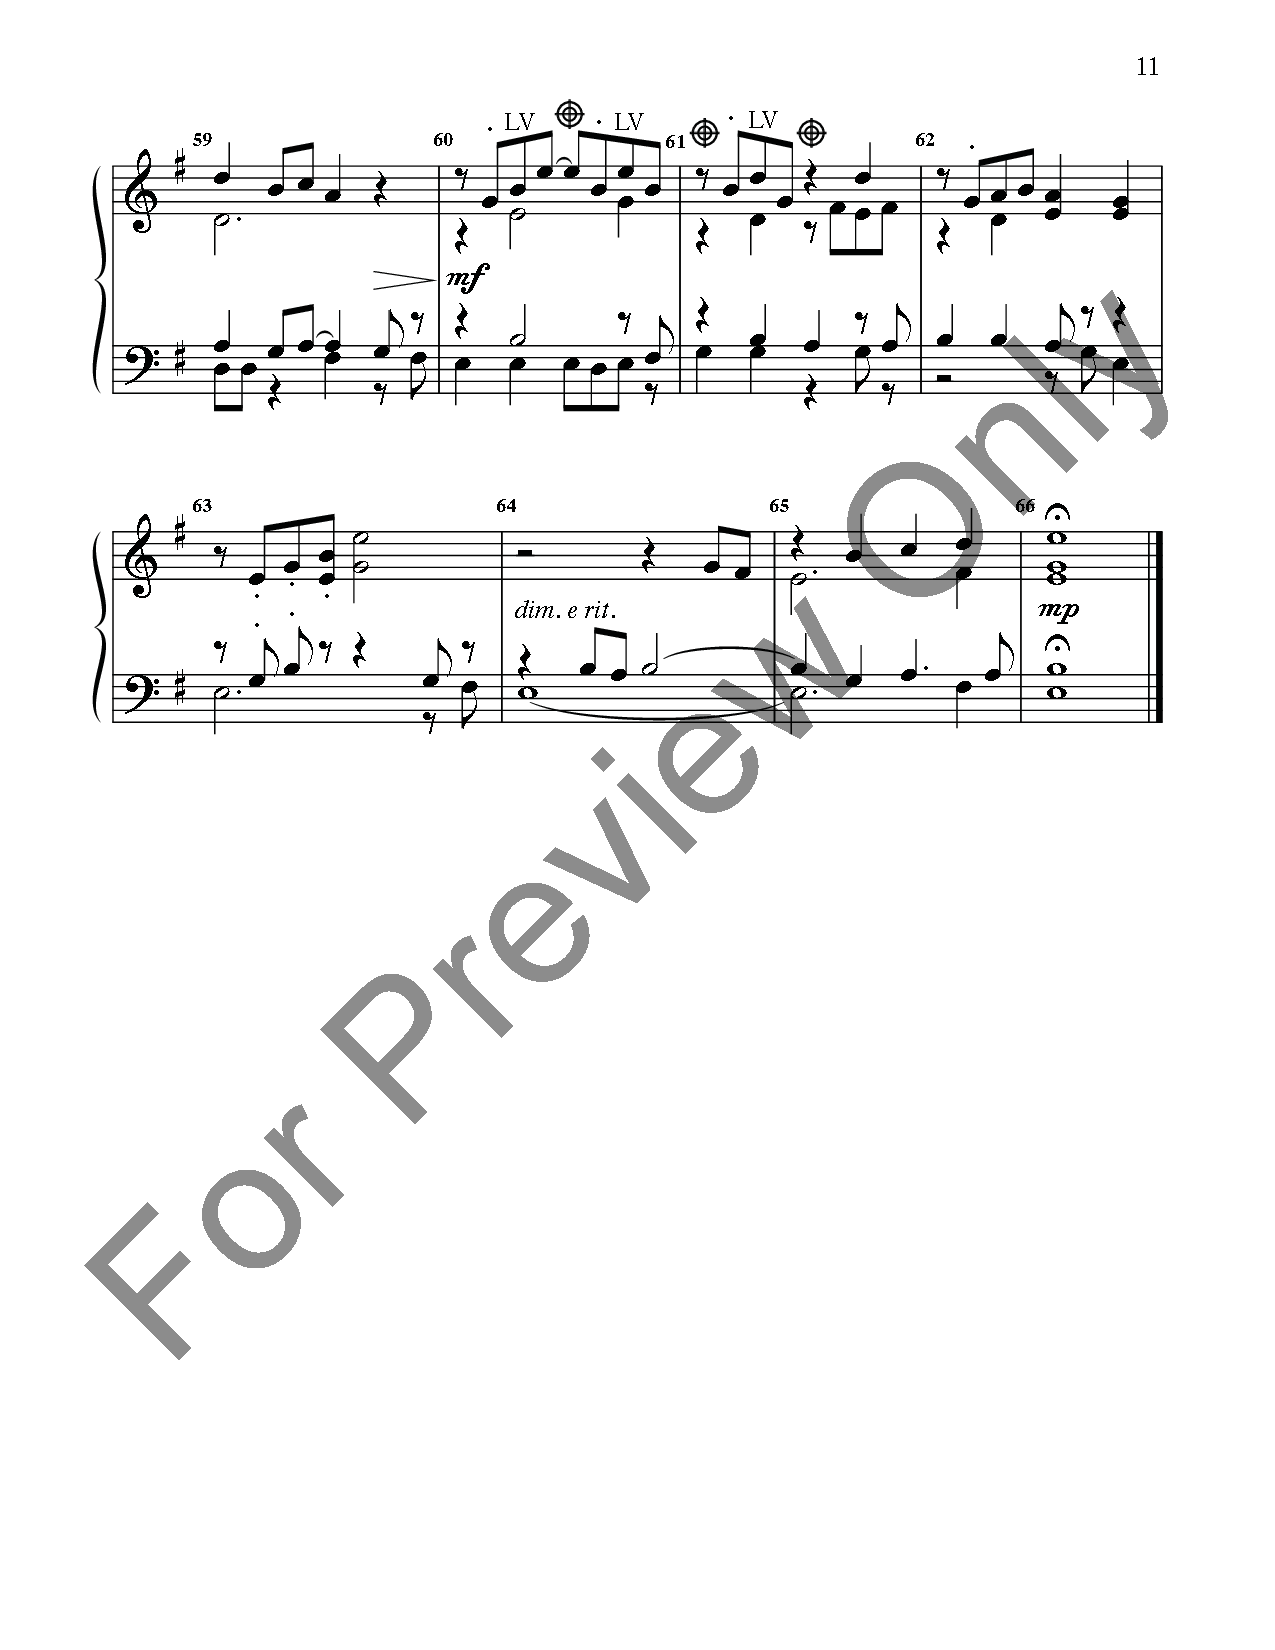 Three Tunes for Six Ringers, No. 1 Thumbnail